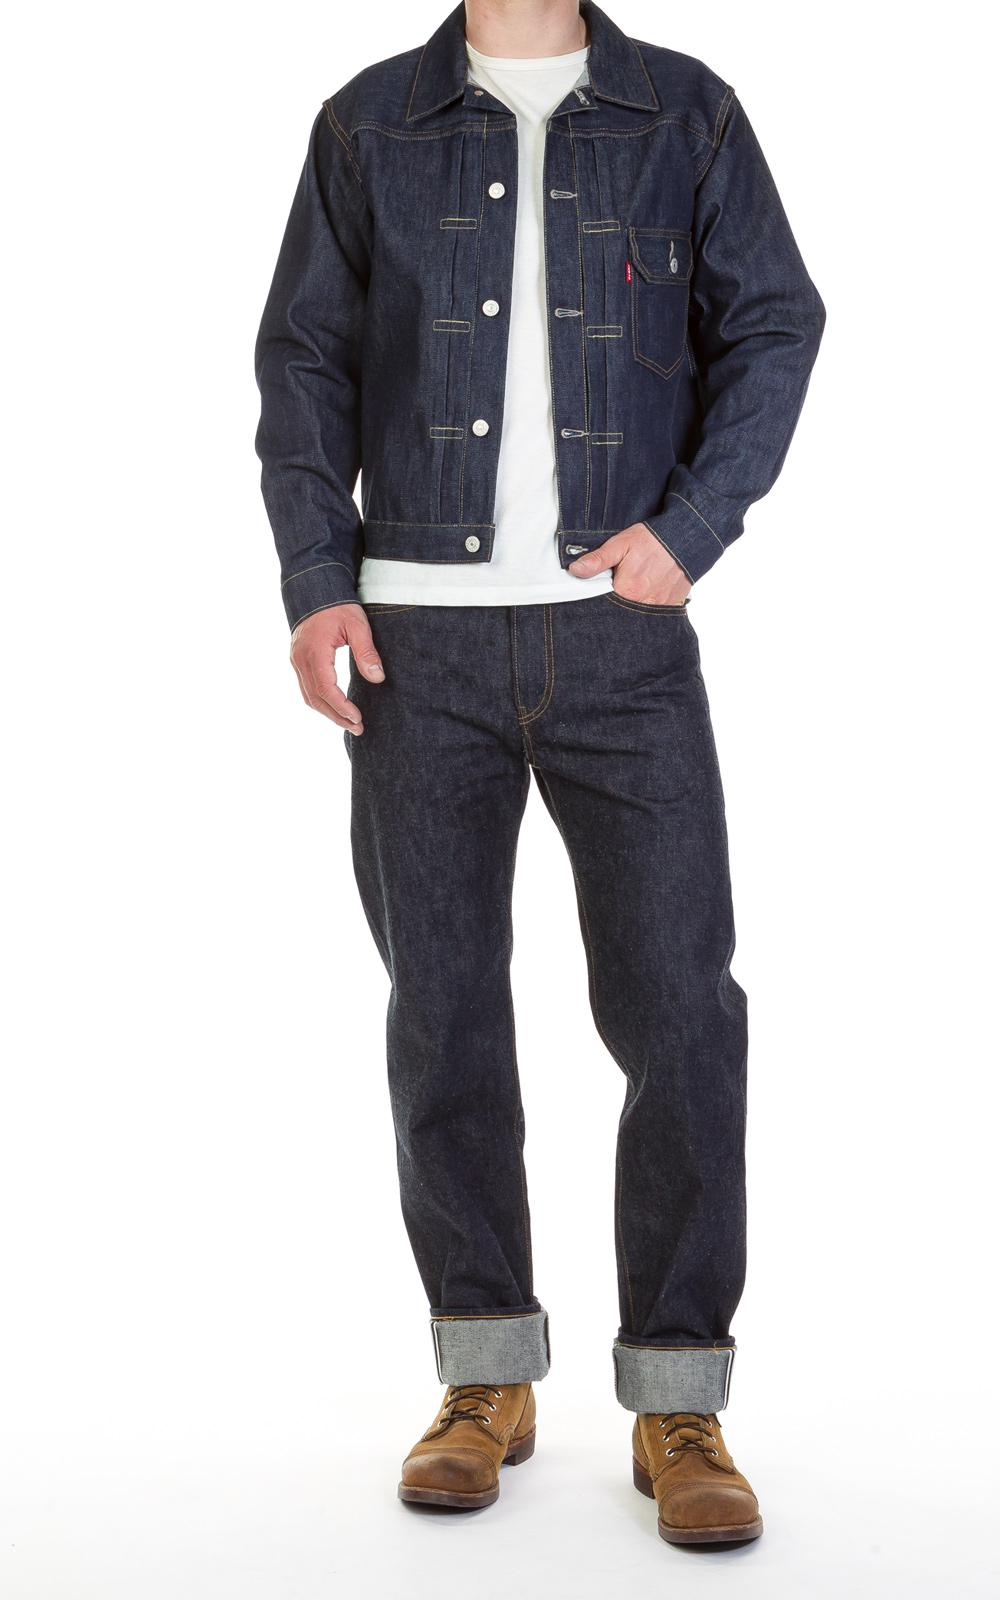 Levi's Cotton Levi ́s® Vintage Clothing 1936 Type I Jacket Rigid 12.5oz in Blue for Men